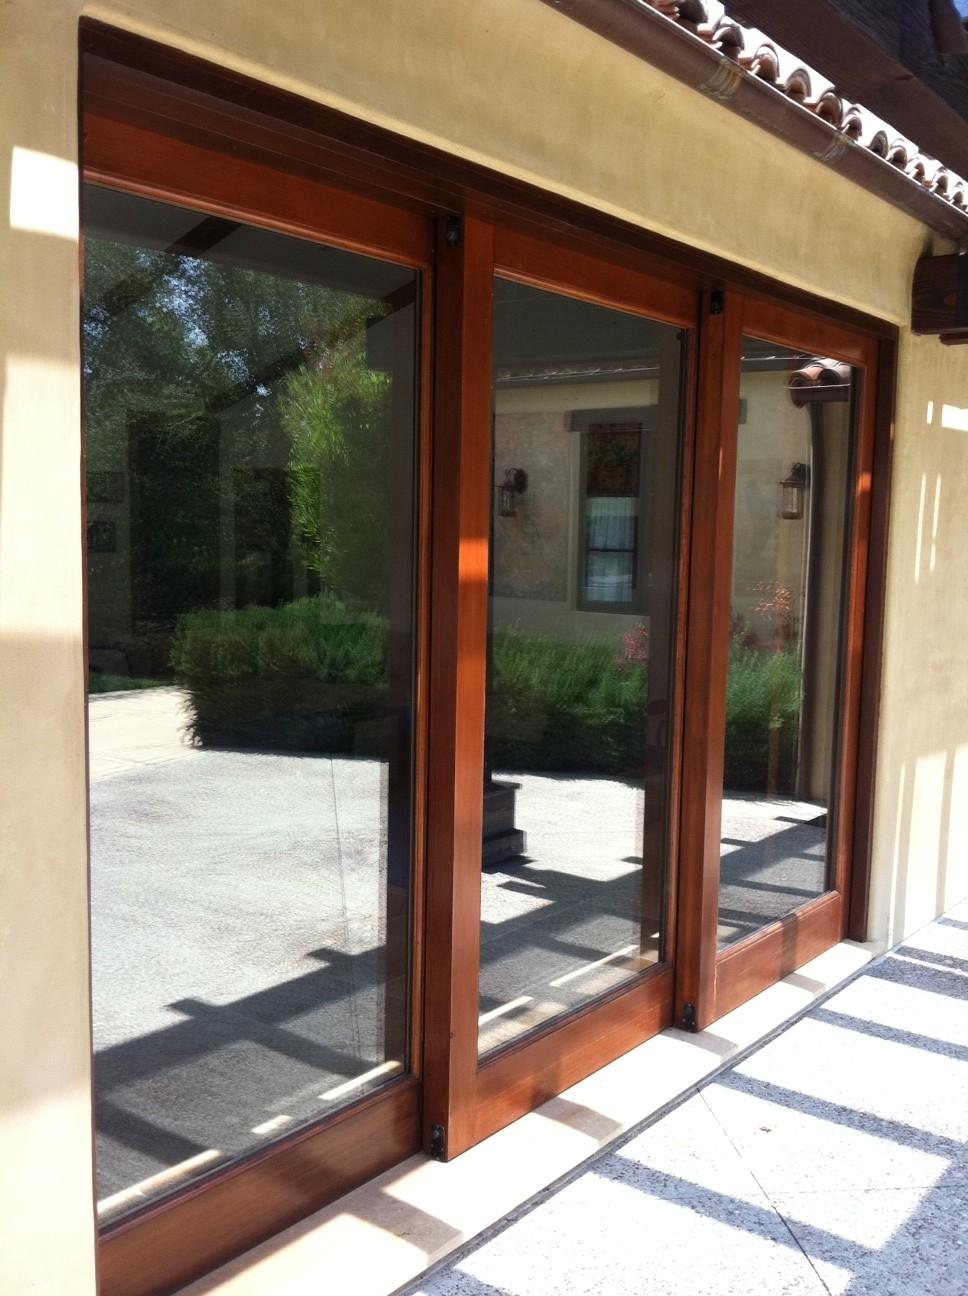 Best Grease For Sliding Glass Door | Sliding Doors